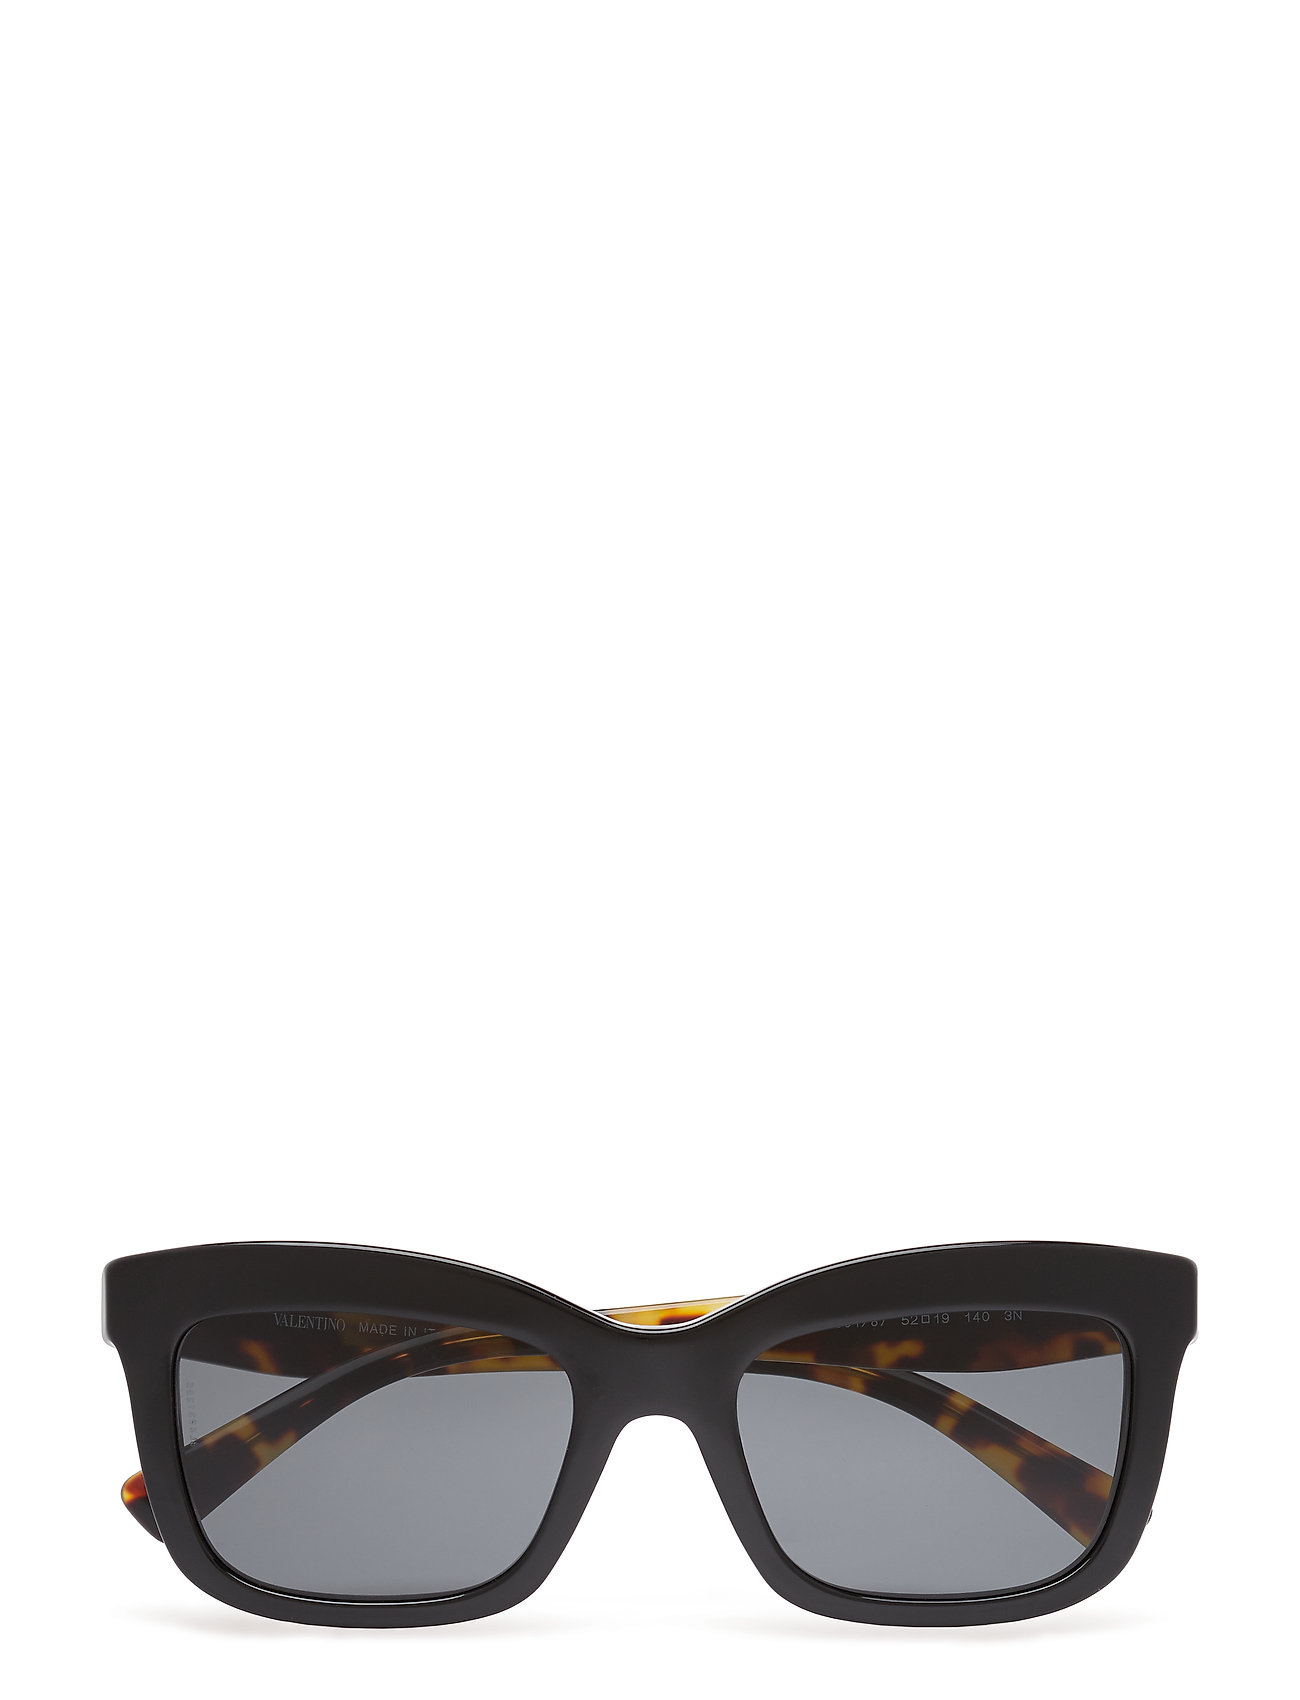 Rockstud Vol Ii - Valentino Sunglasses